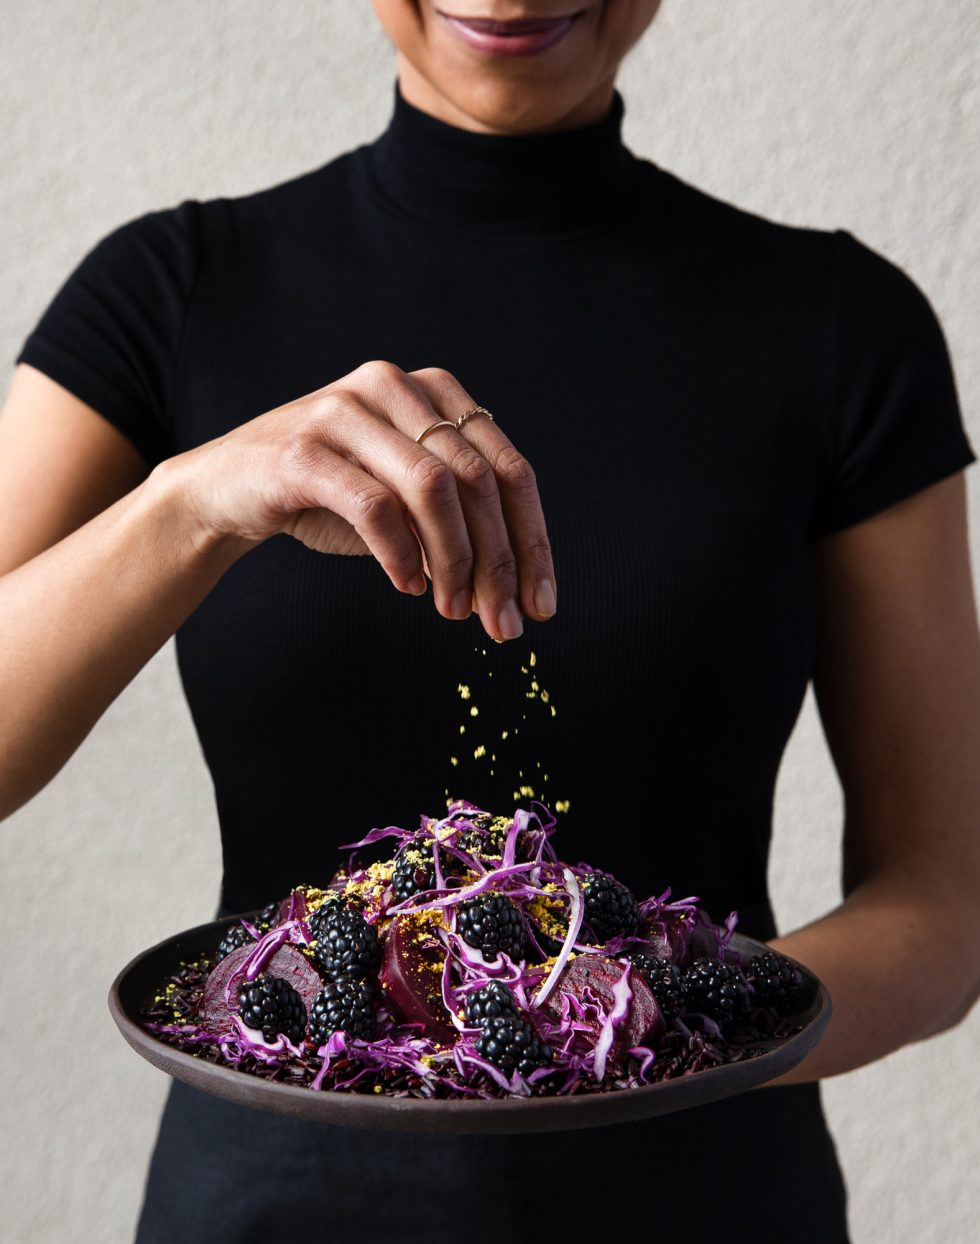 salad-genevieve-plante-book-vegan-food-lifestyle-photographer-laura-g-diaz